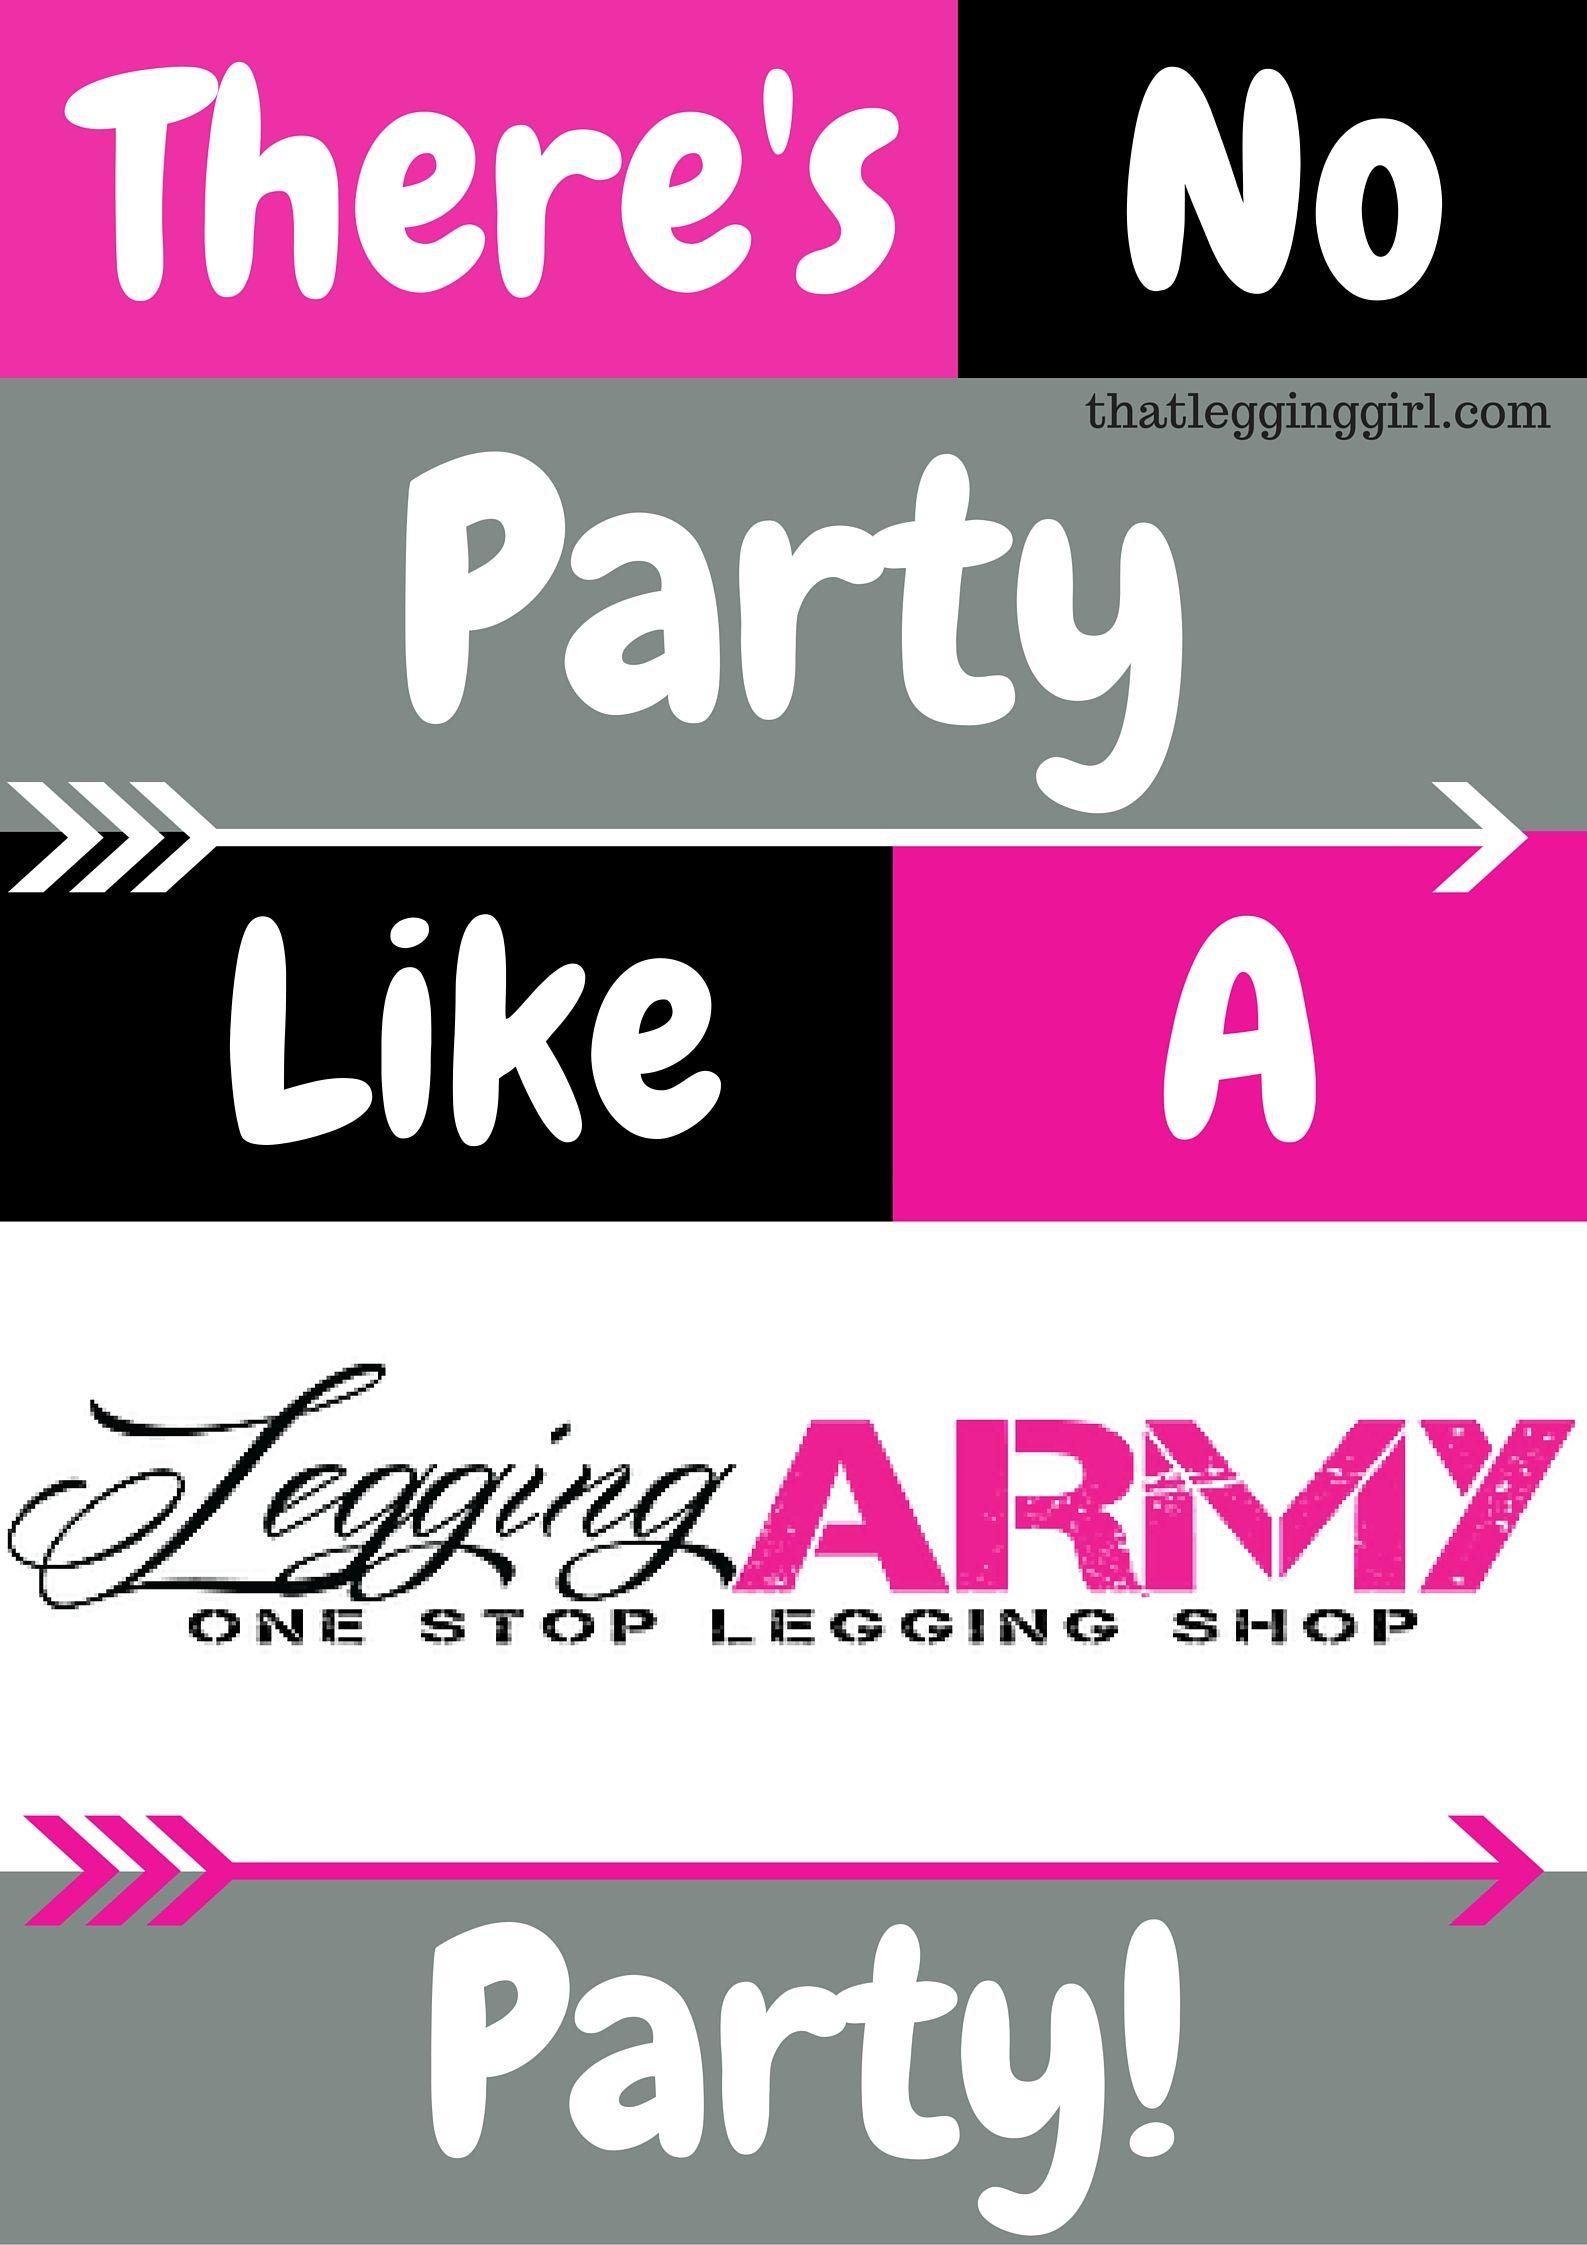 Legging army coupon code